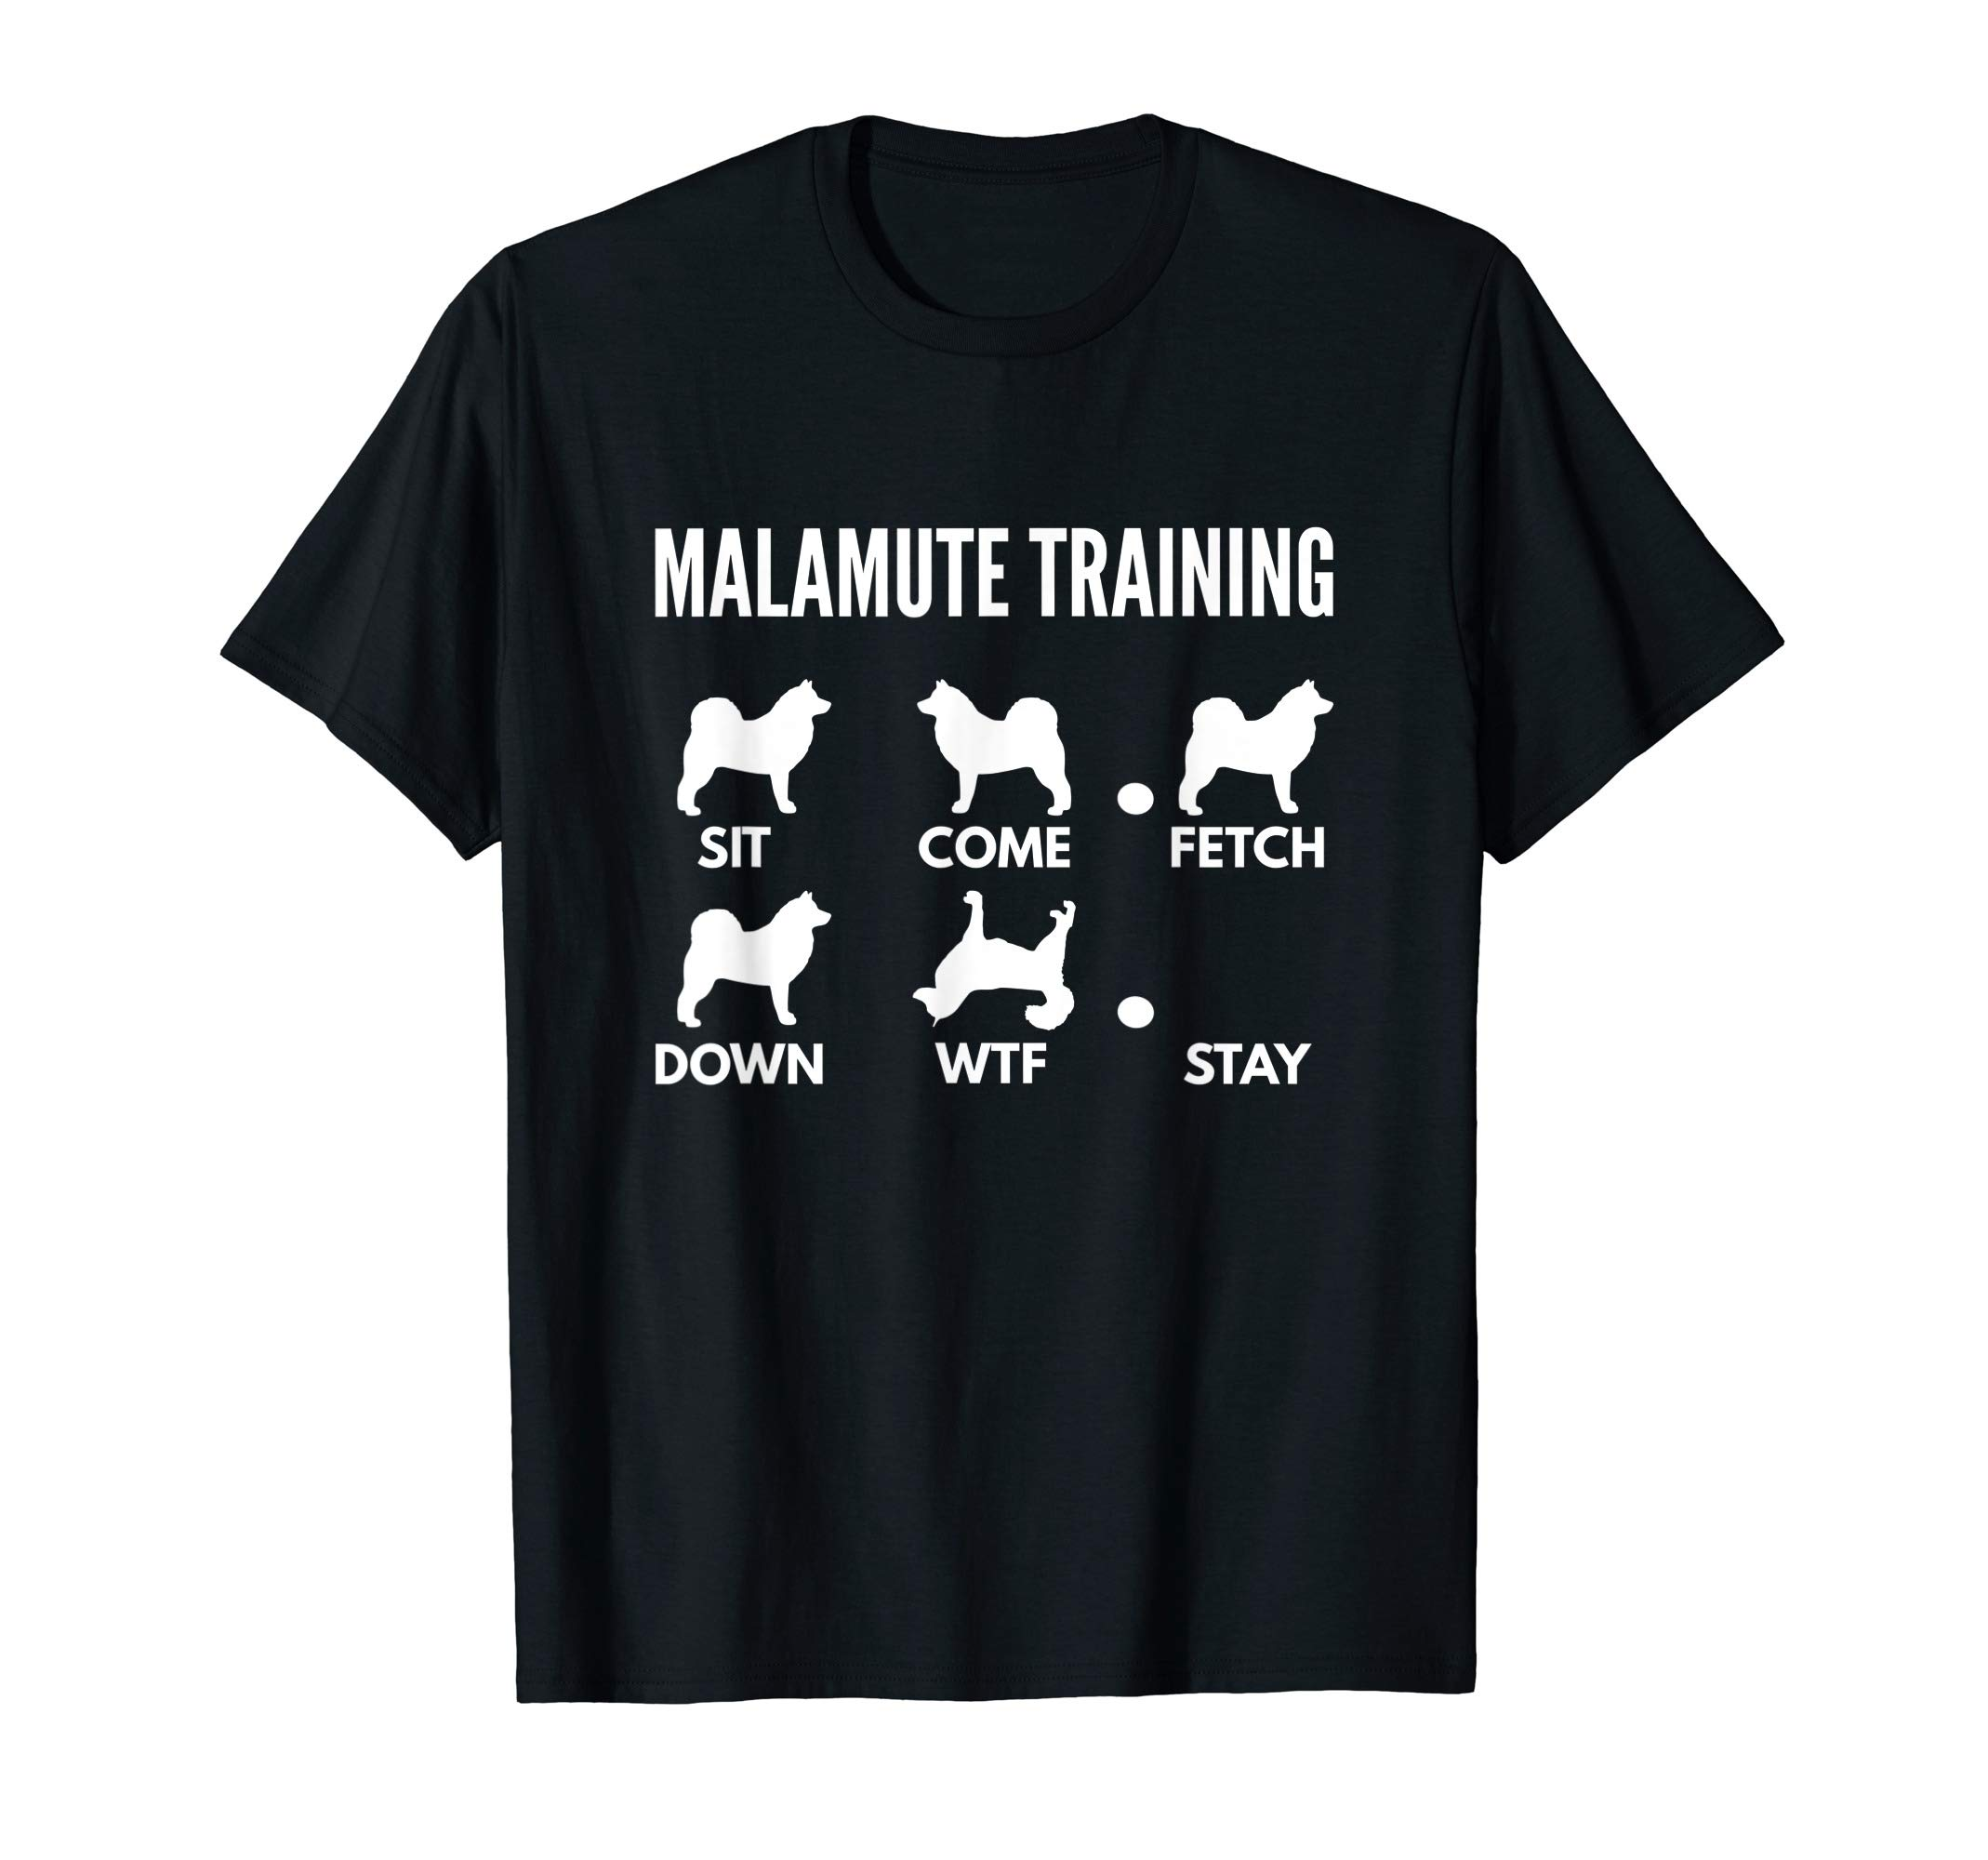 Malamute Training – Alaskan Malamute Tricks T-Shirt